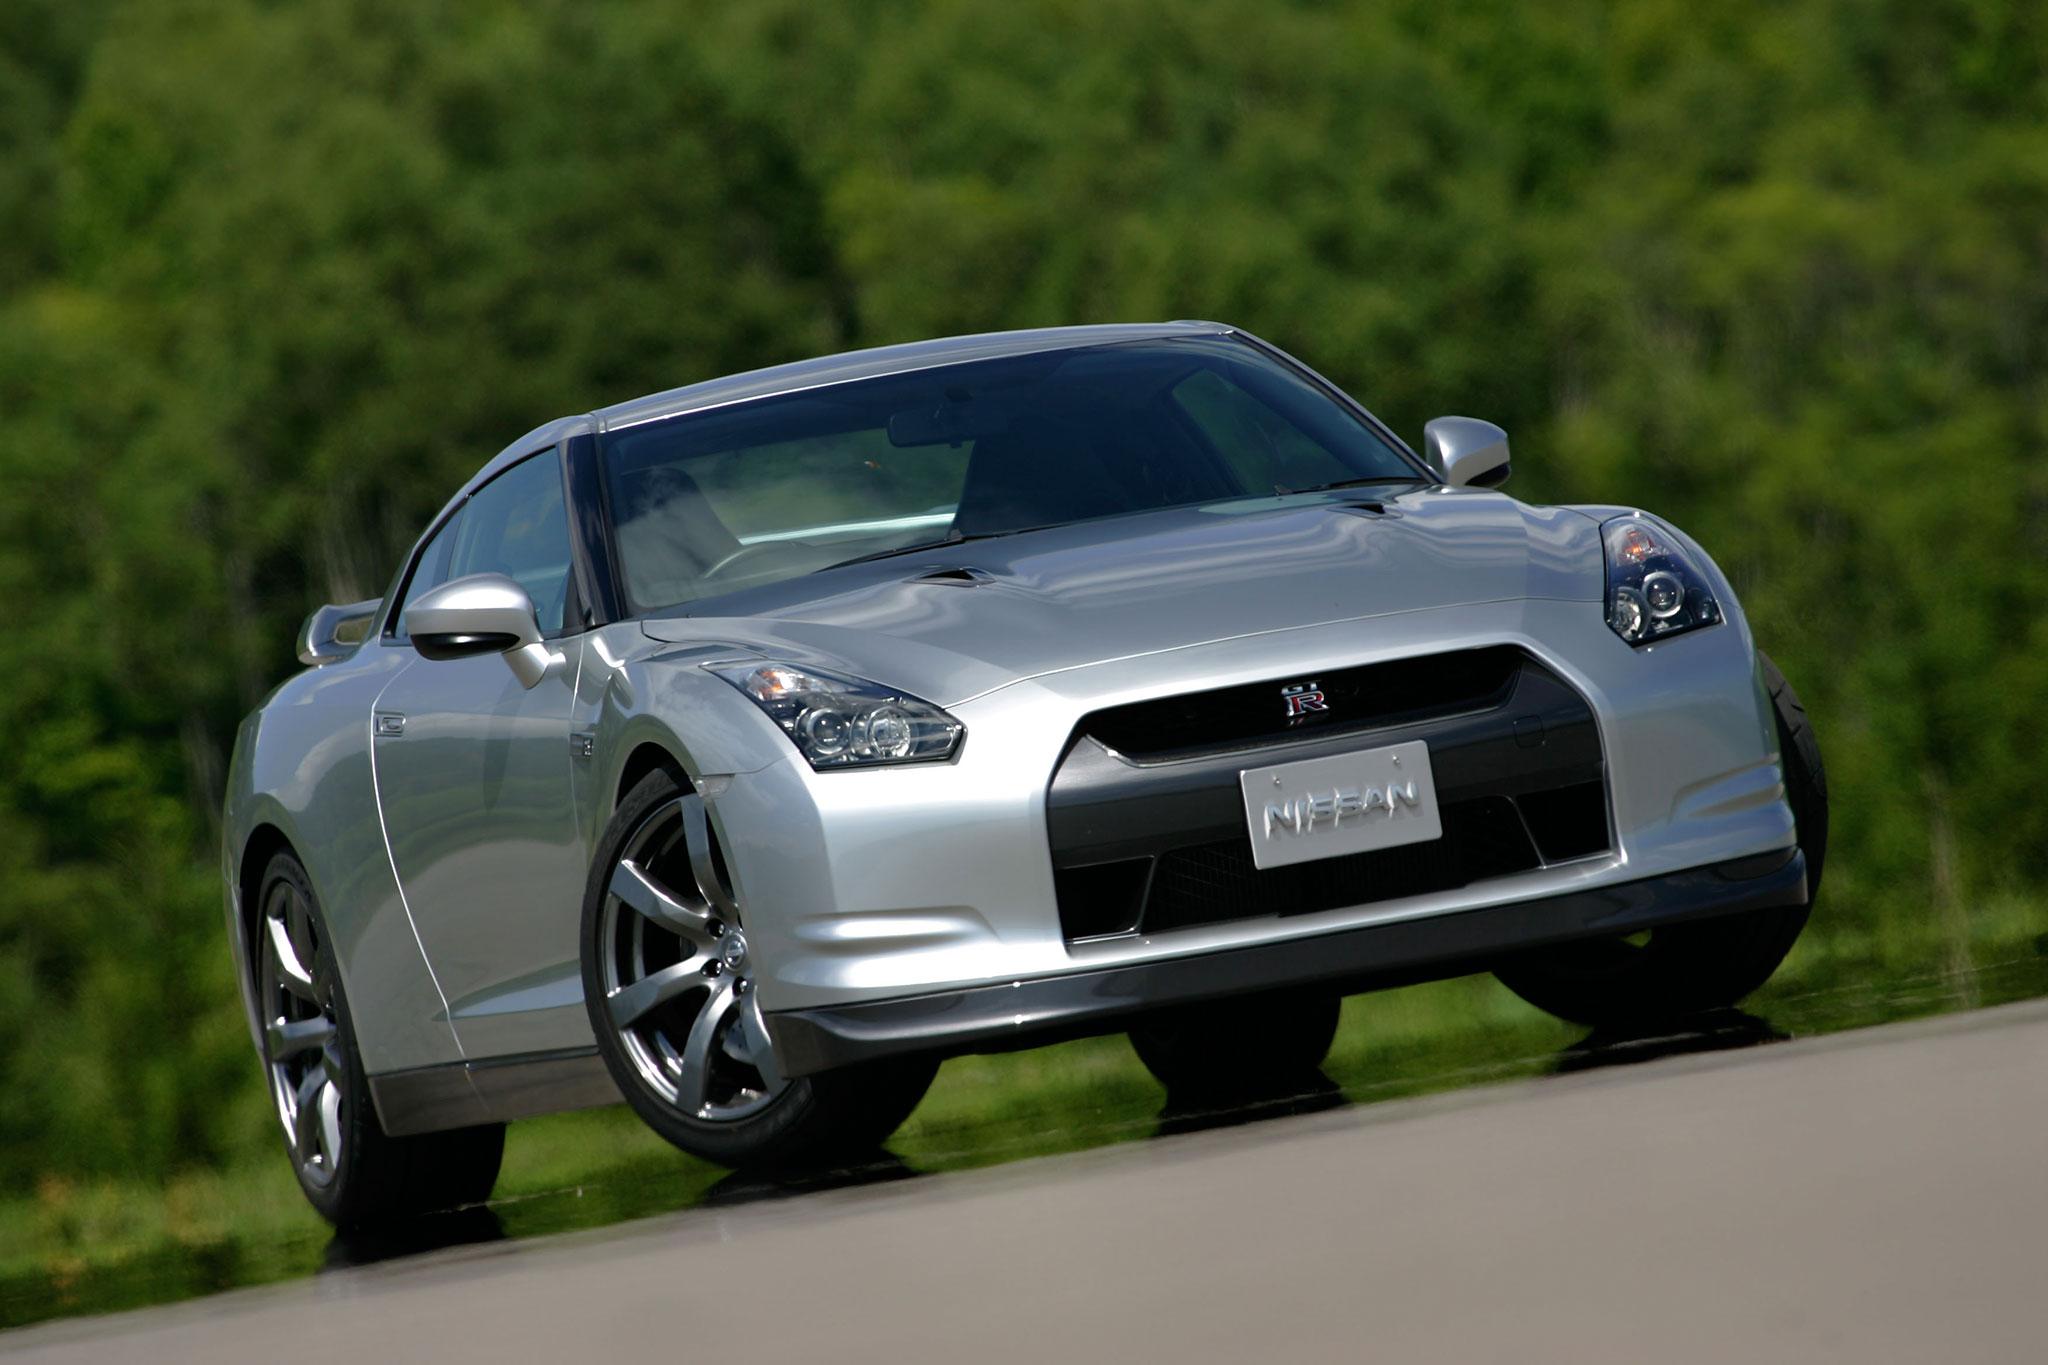 2010 Nissan Gt R Four Seasons Wrap Up Infiniti M37 Fuse Box Show More